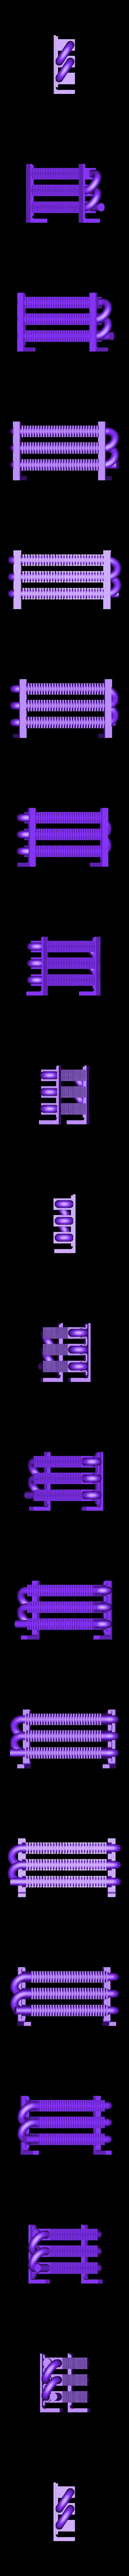 Radiator_Core_a.STL Download free STL file 4-8-8-4 Big Boy Locomotive • 3D printer object, RaymondDeLuca